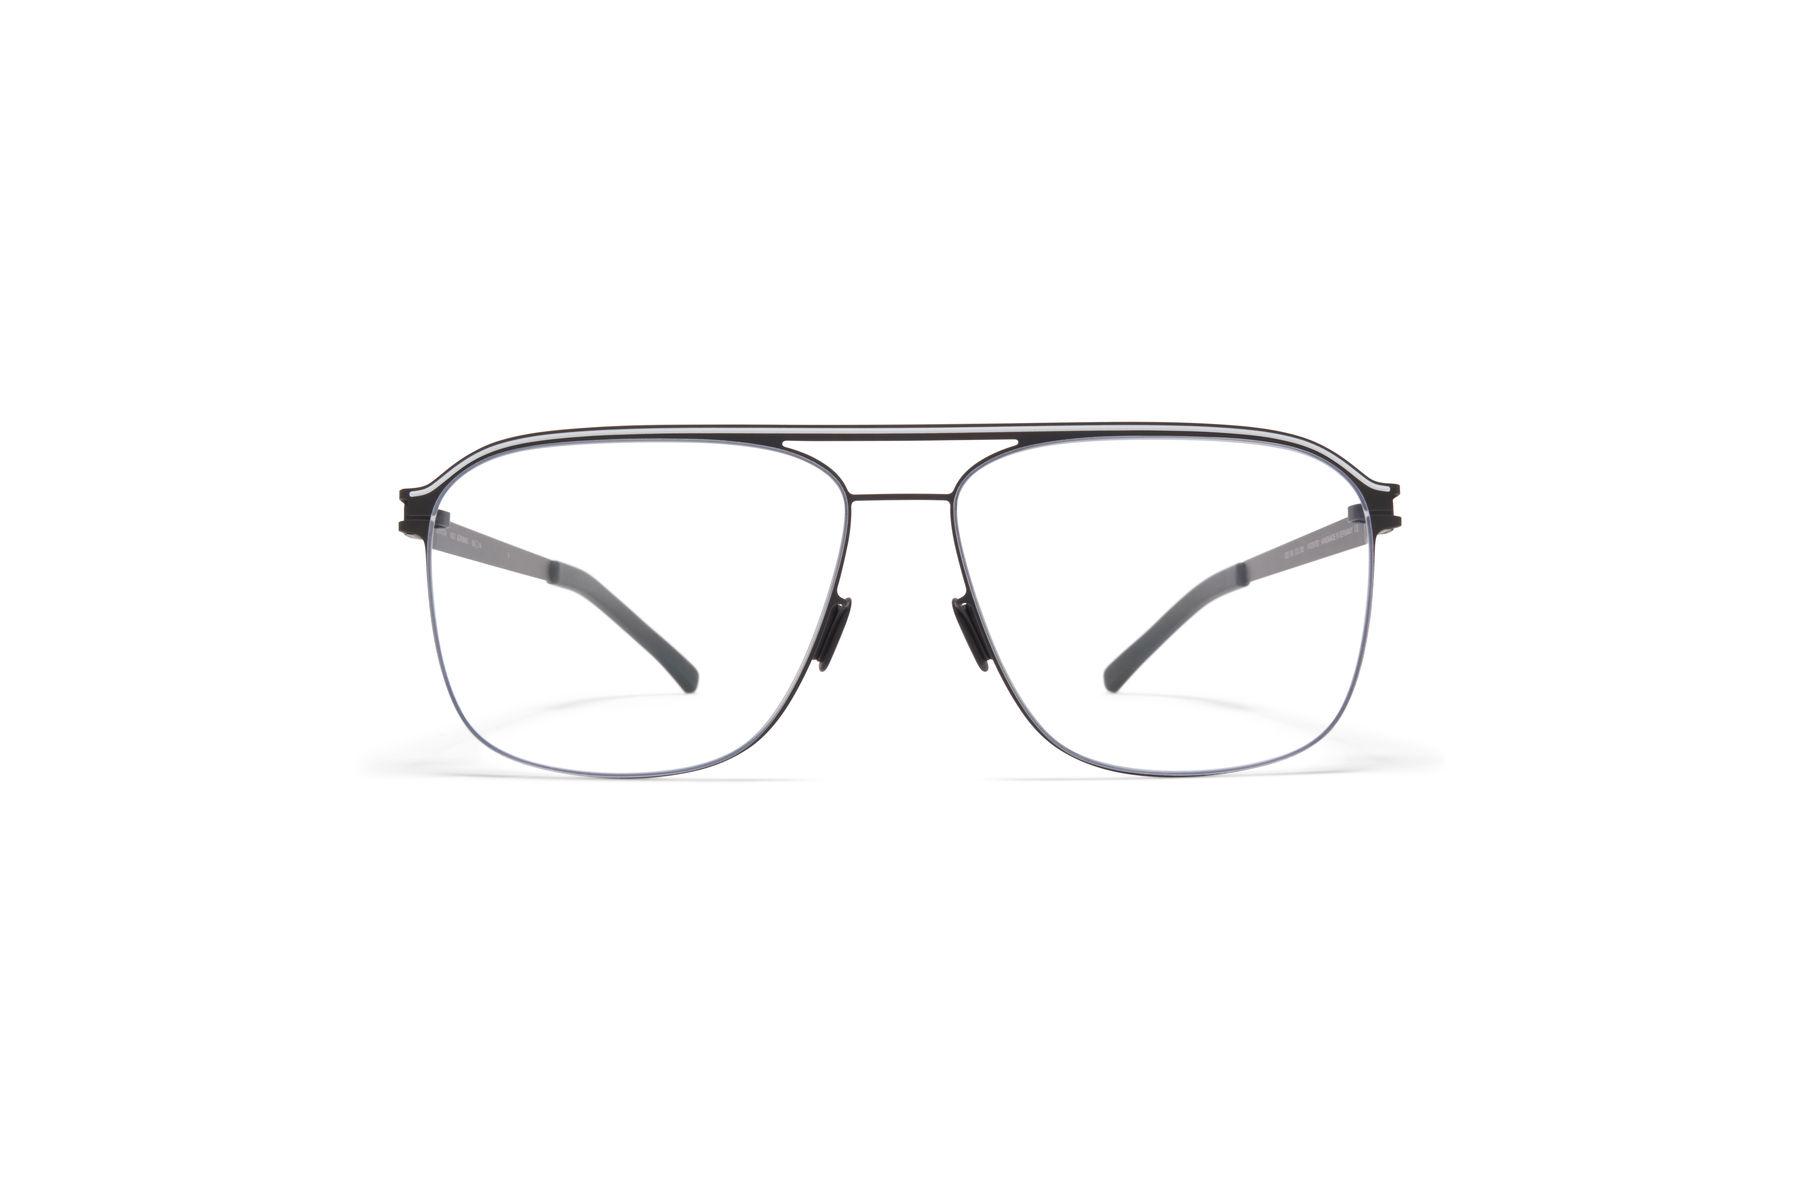 mykita-no1-rx-adriano-black-white-clear-front